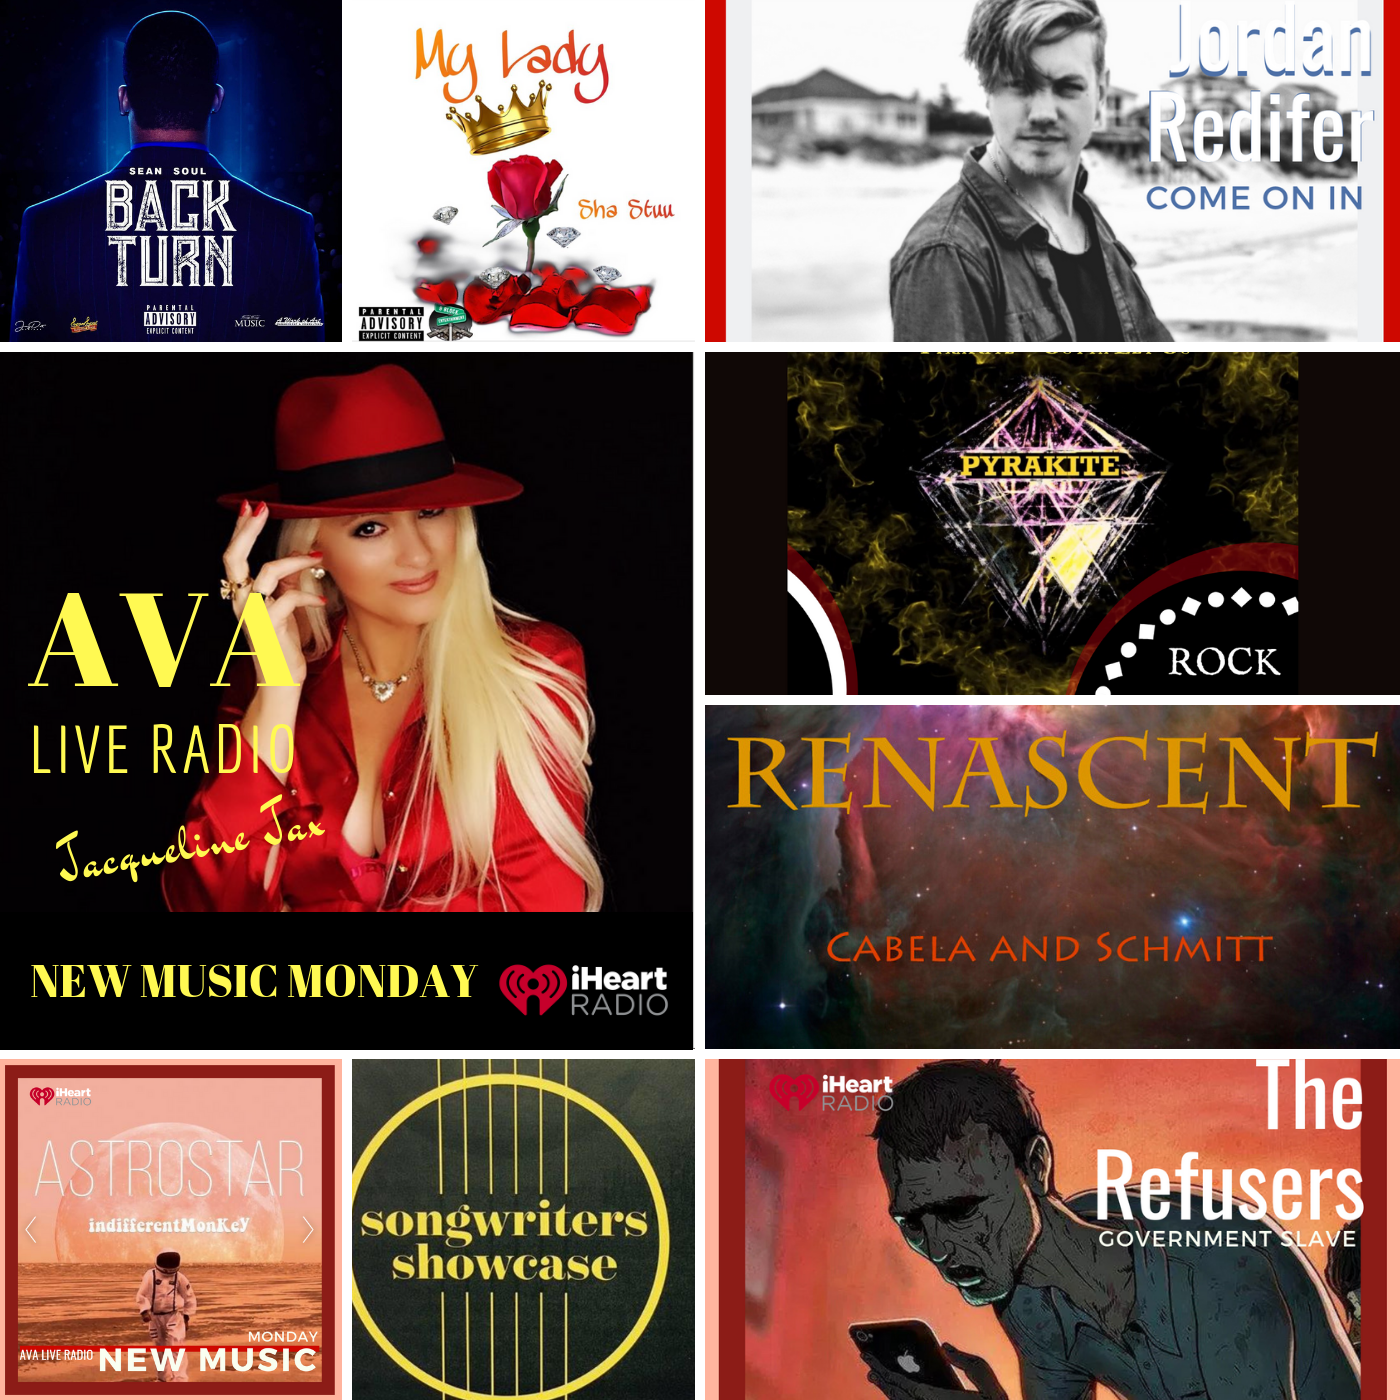 6 17 New Music Monday with Jacqueline Jax on AVA Live Radio